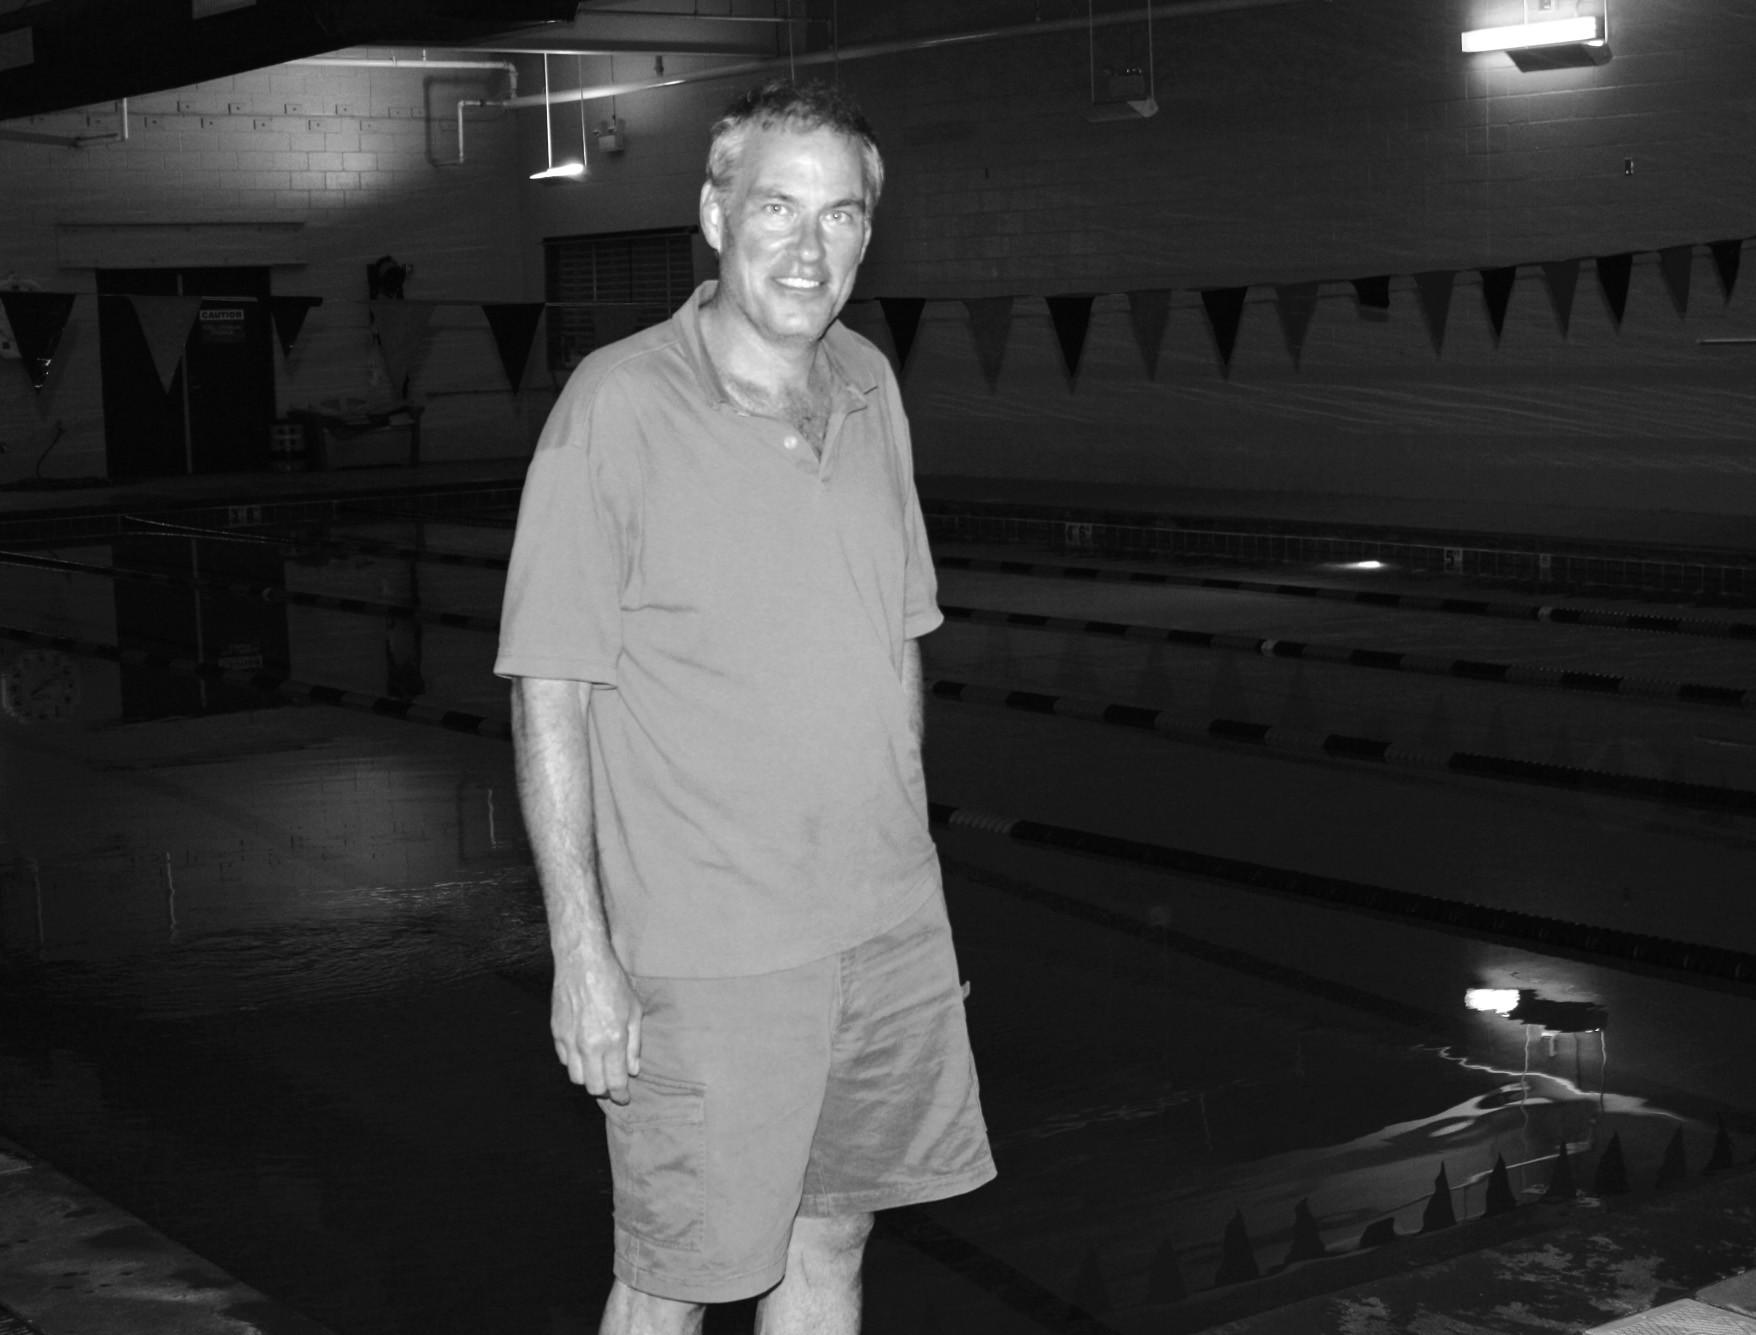 Swim coach Alan Farrow has coached at Auburn and Georgia Tech.